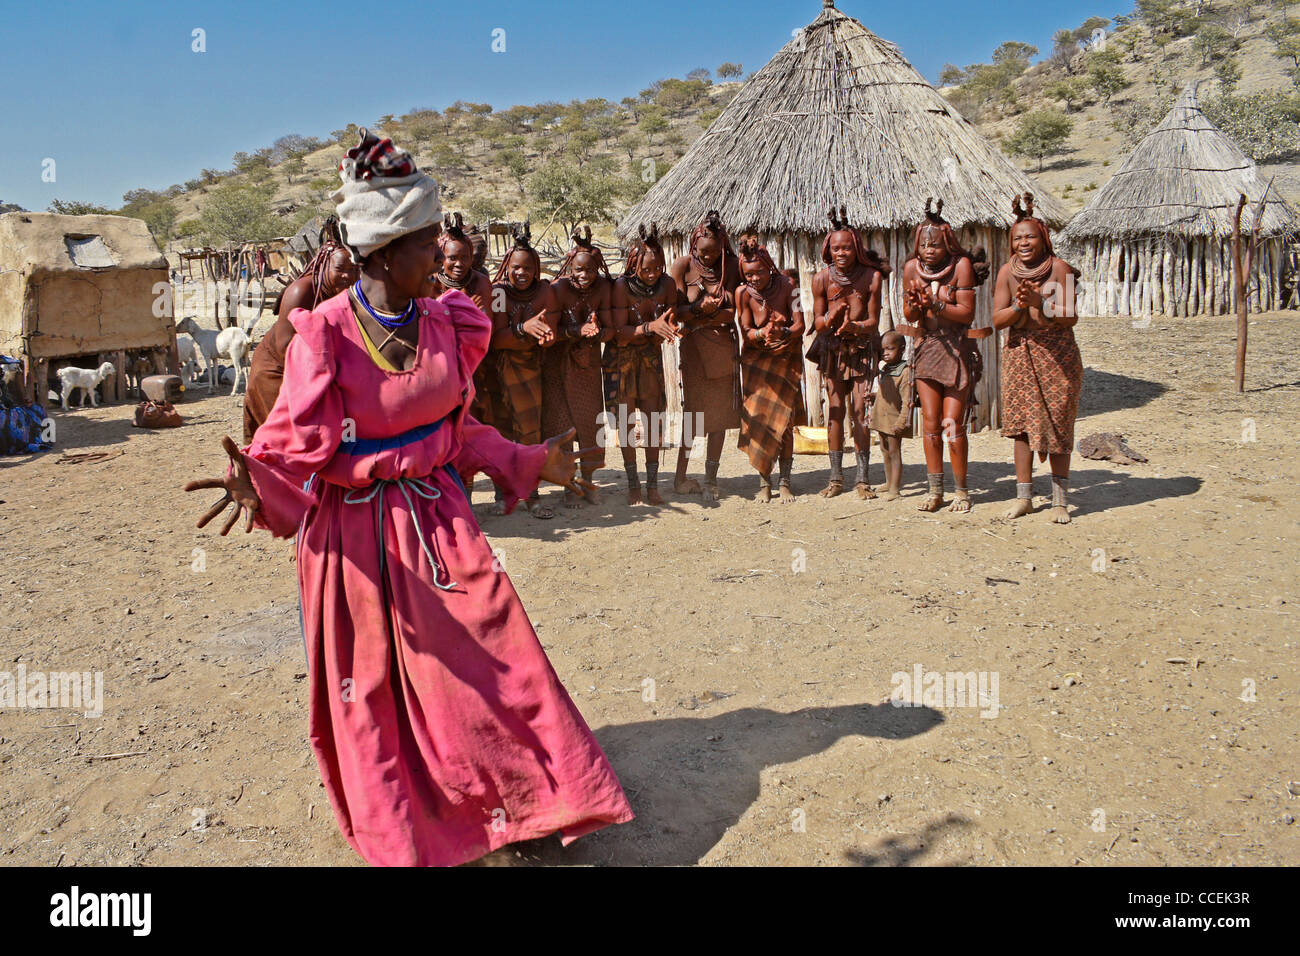 Himba women singing and dancing in village near Opuwo, Namibia - Stock Image